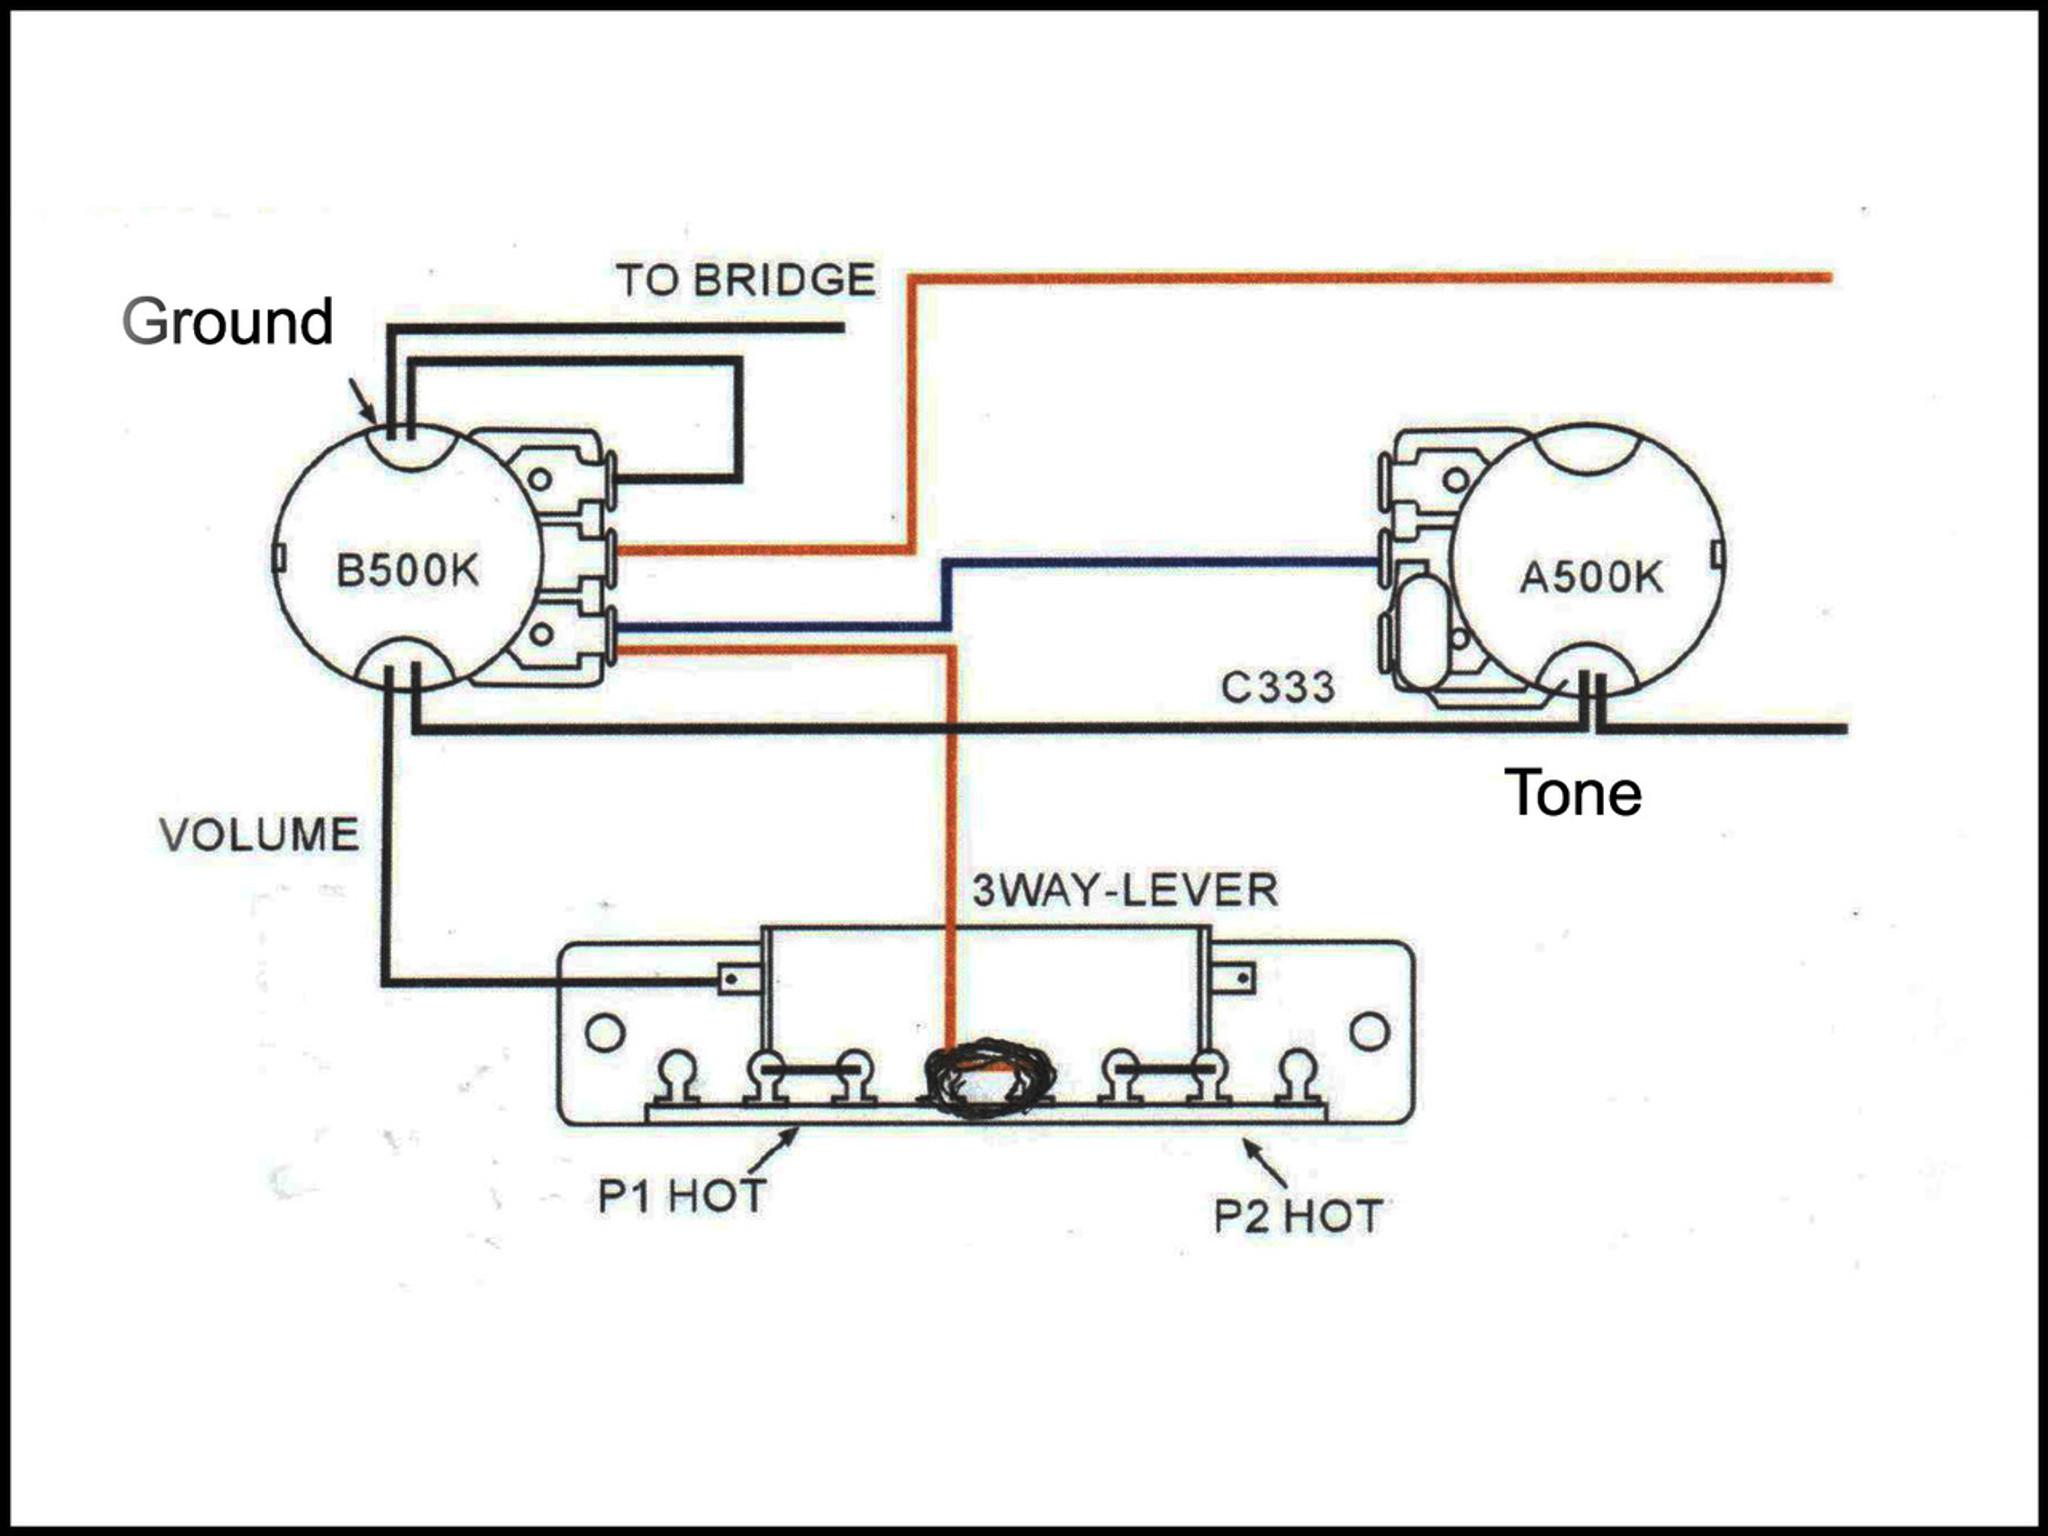 Piezo Bridge Wiring Electrical Diagrams Diagram Schematic Circuit Connection U2022 Rpm Activated Switch